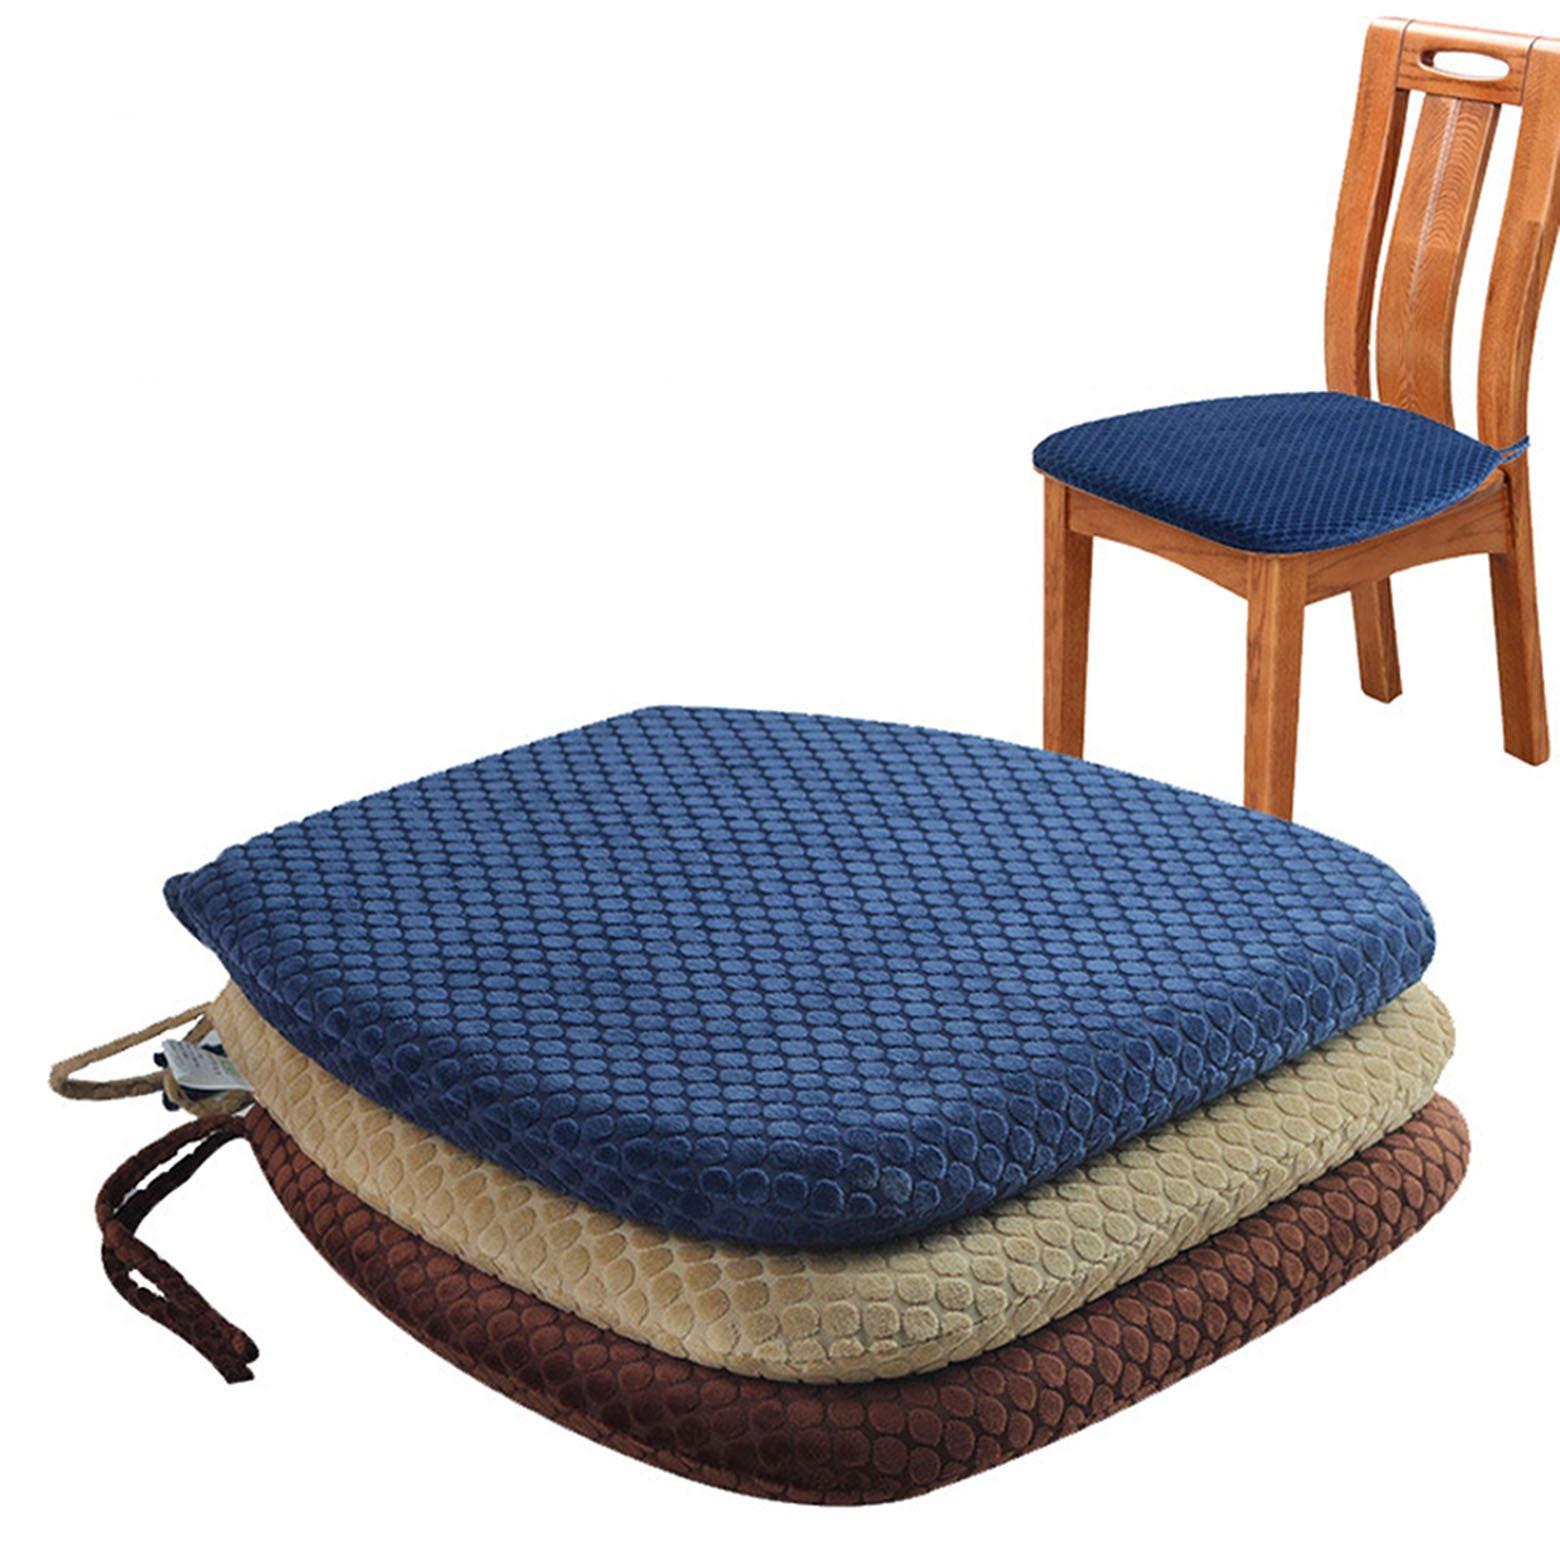 Velvet Memory Foam Chair Cushion, Memory Foam For Dining Room Chairs